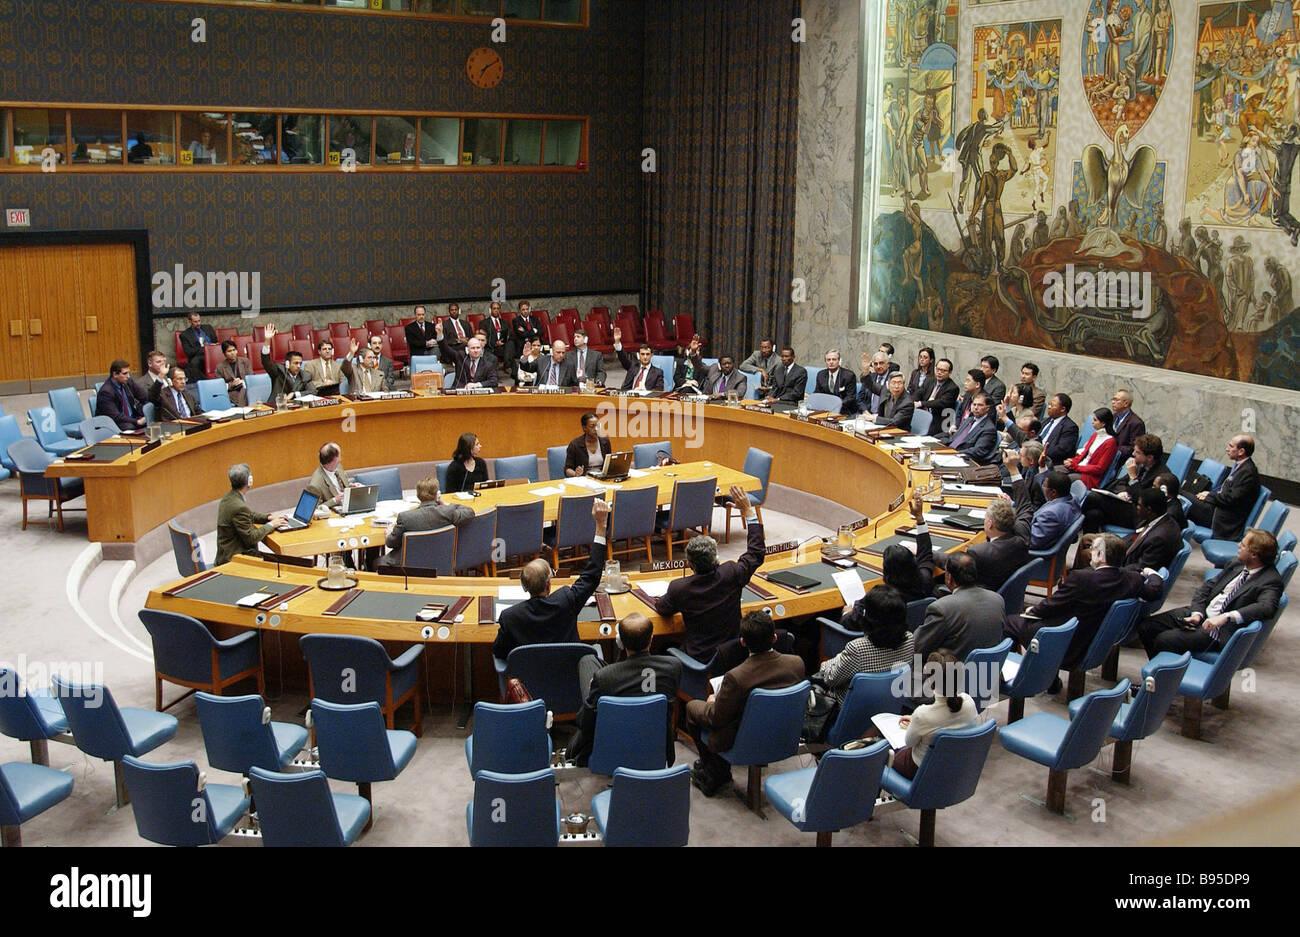 A UN Security Council session - Stock Image